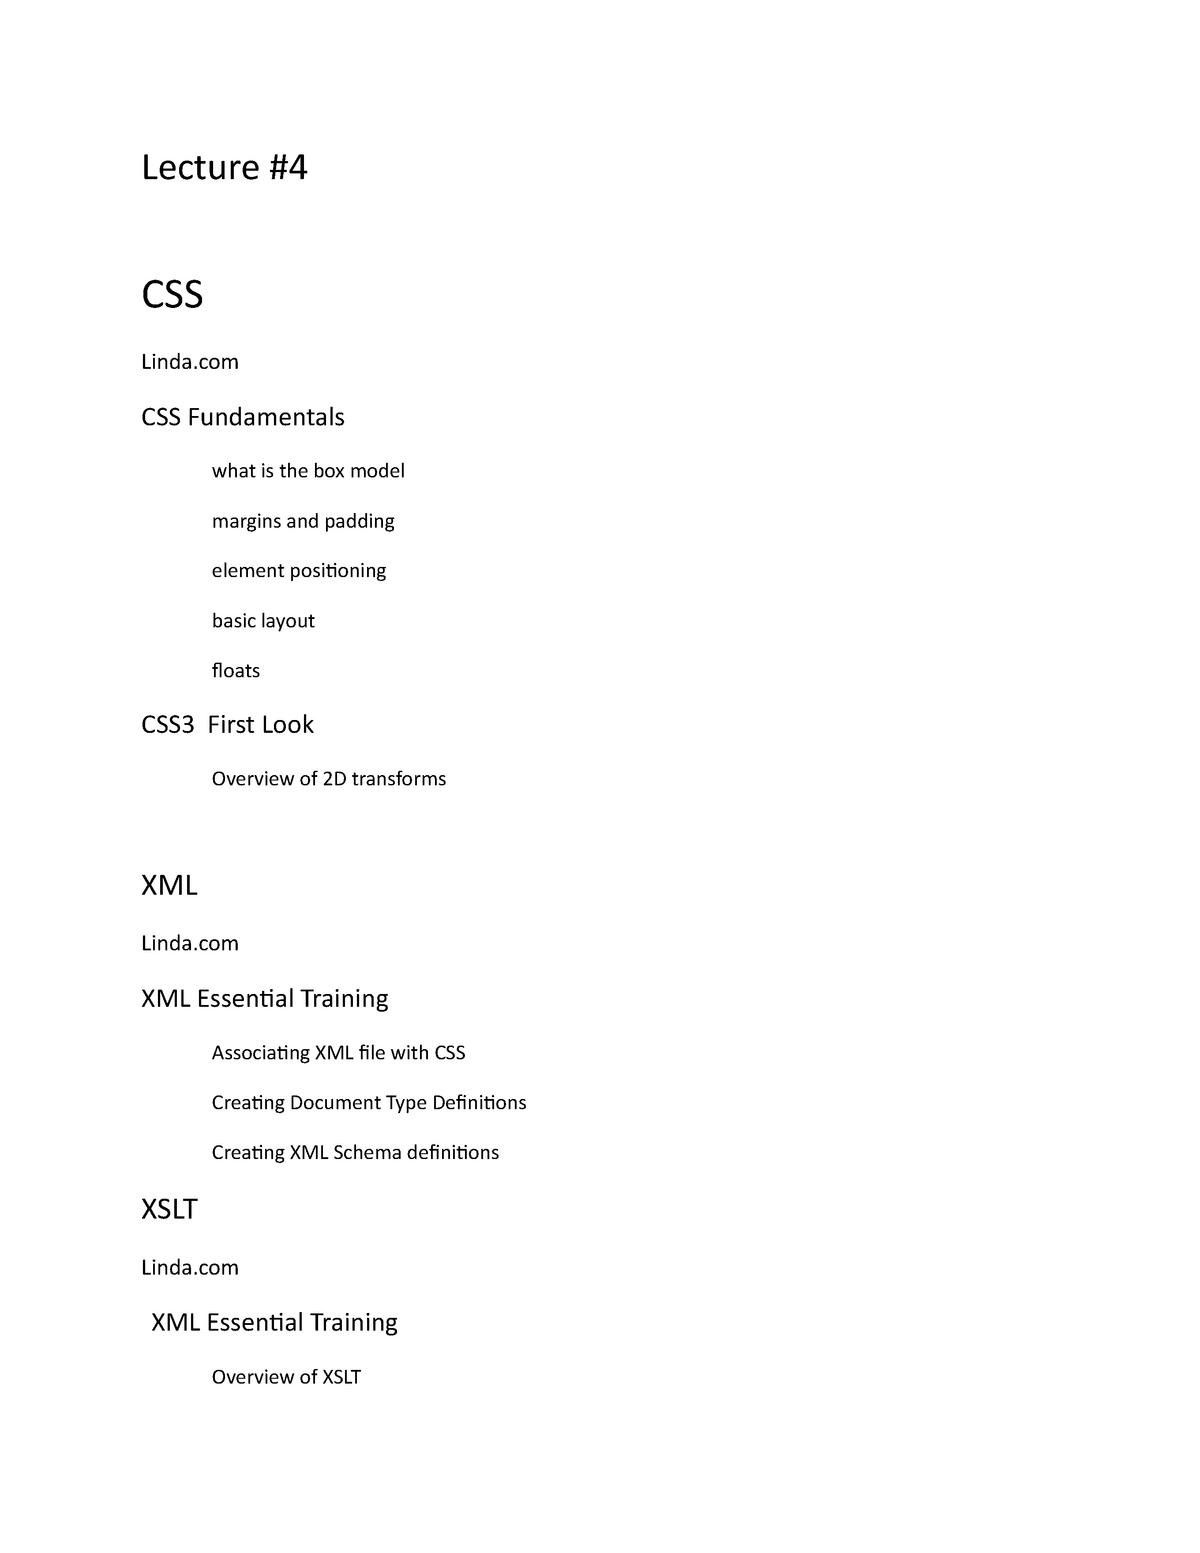 Lecture 4 Web Admin - CIS 4160: Web Applications Development